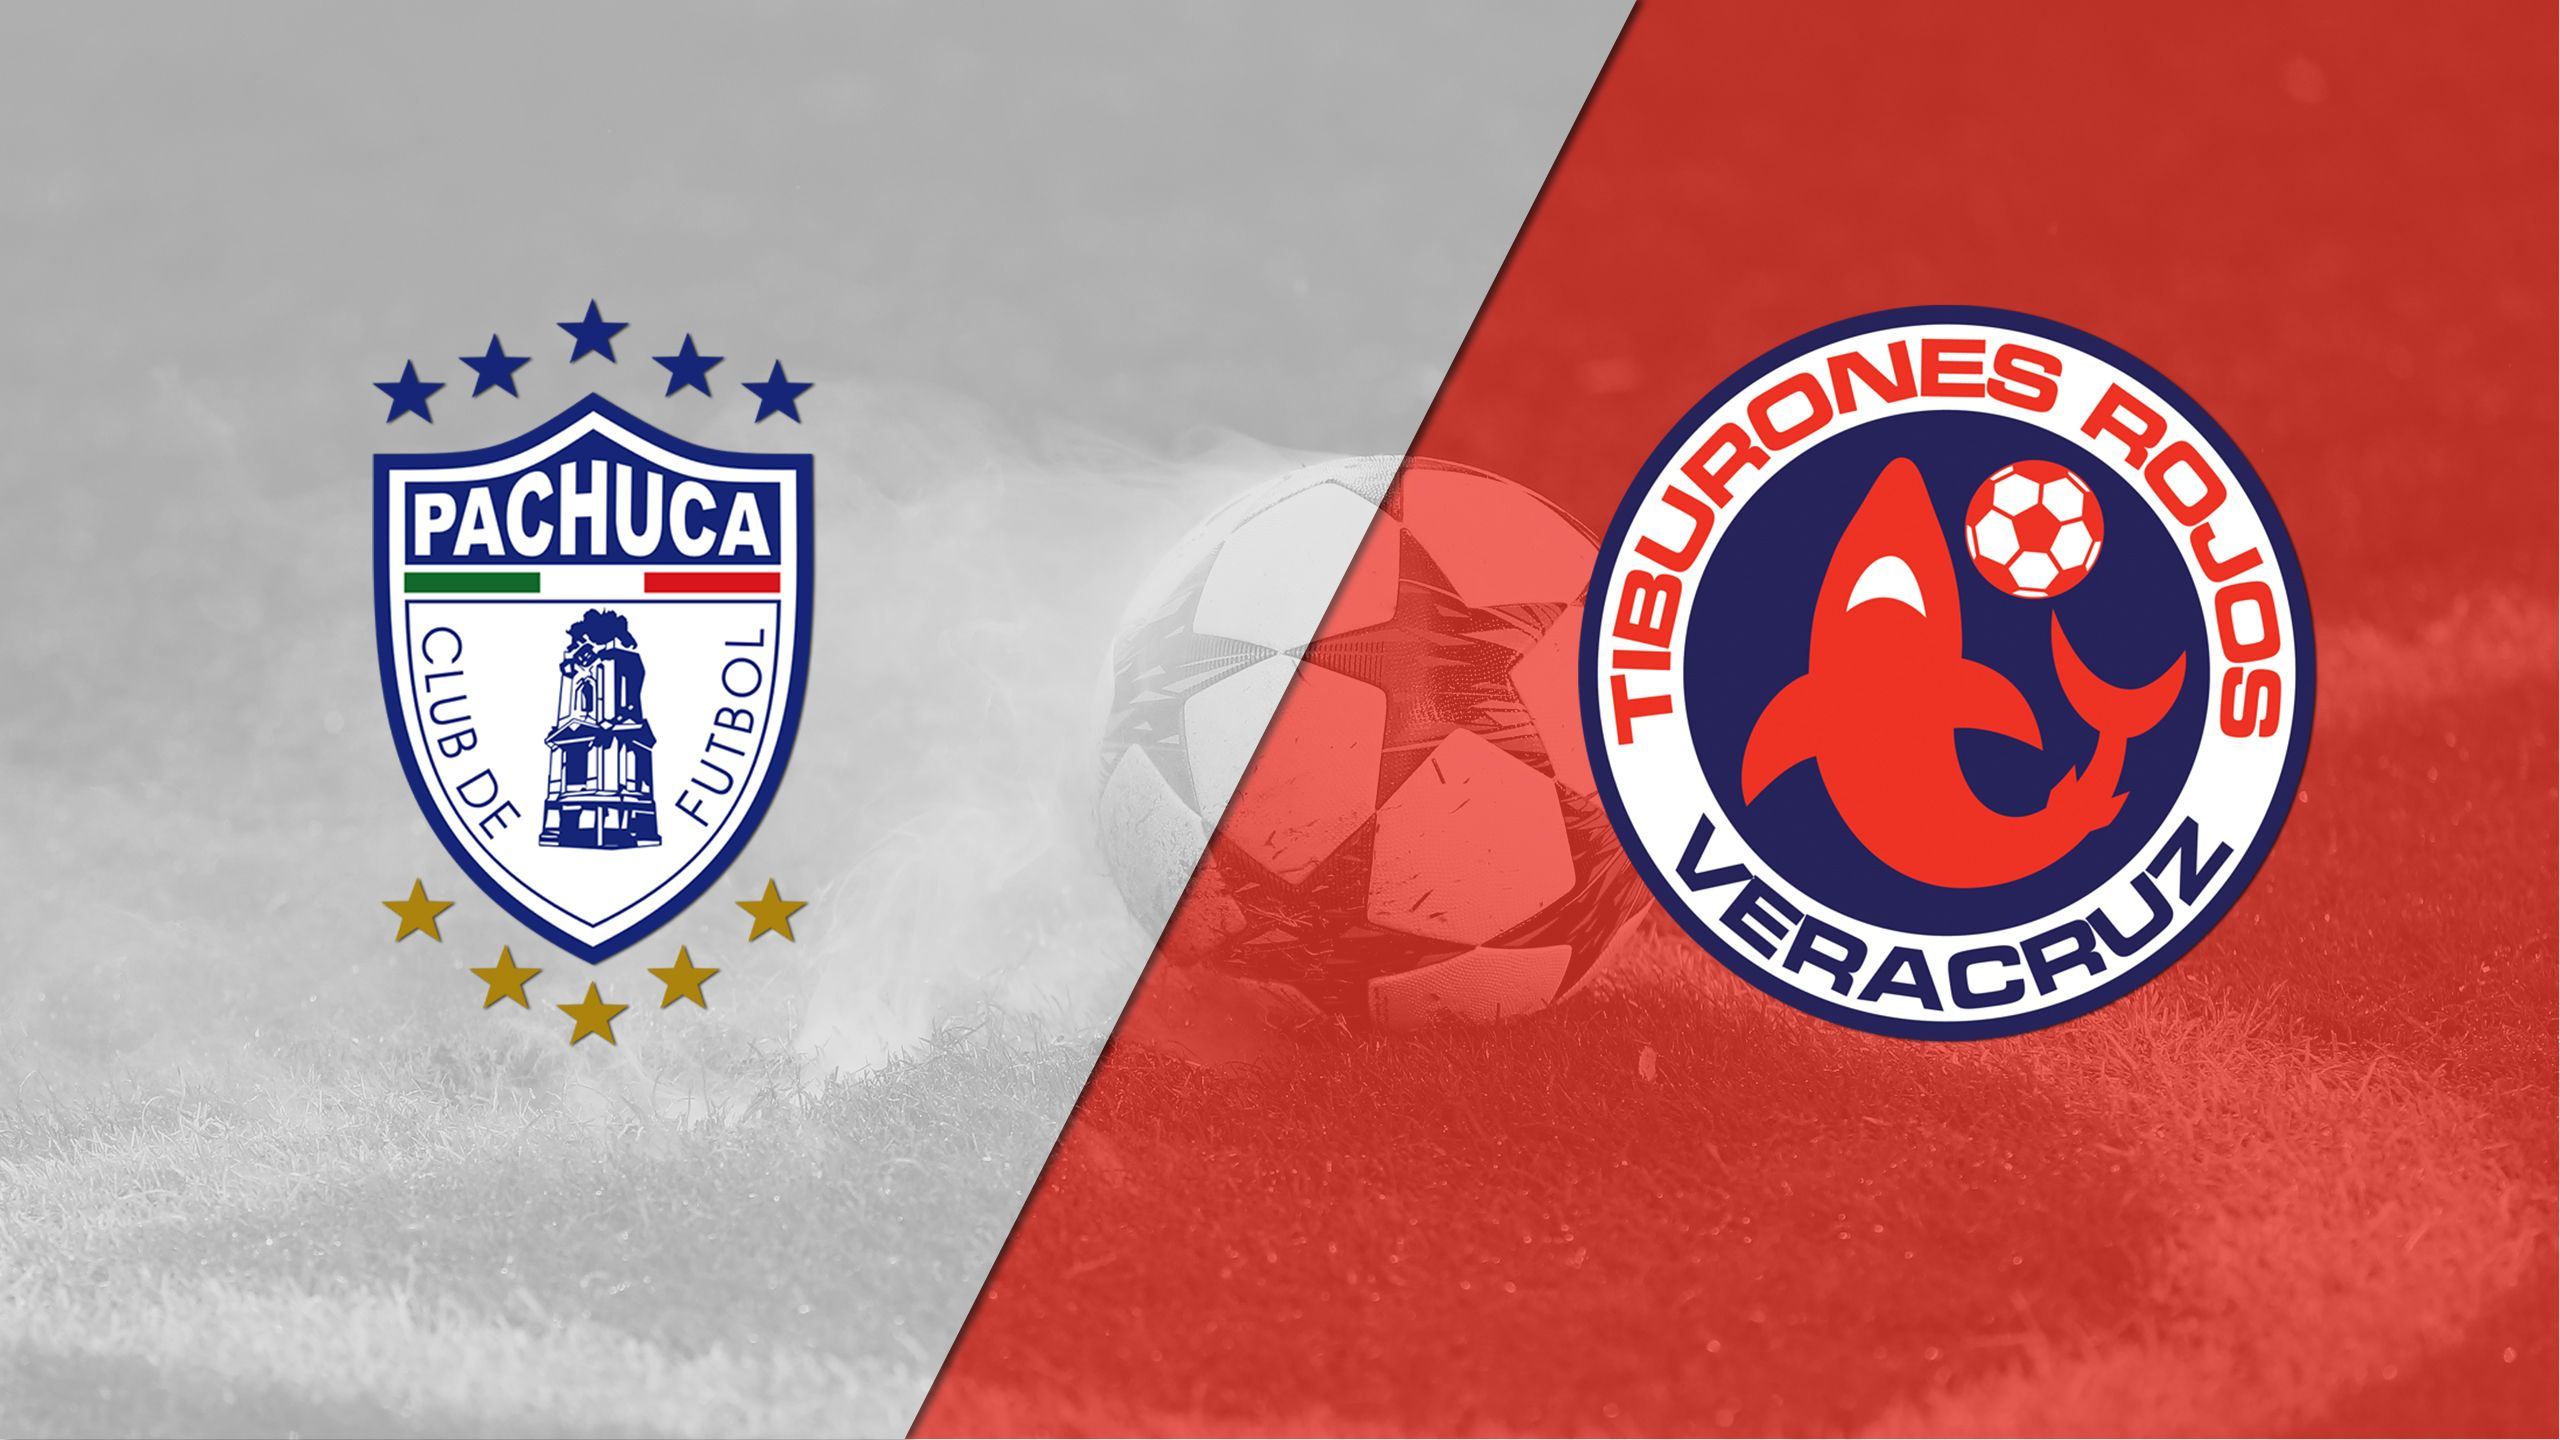 In Spanish - Pachuca vs. Tiburones Rojos de Veracruz (Liga MX)